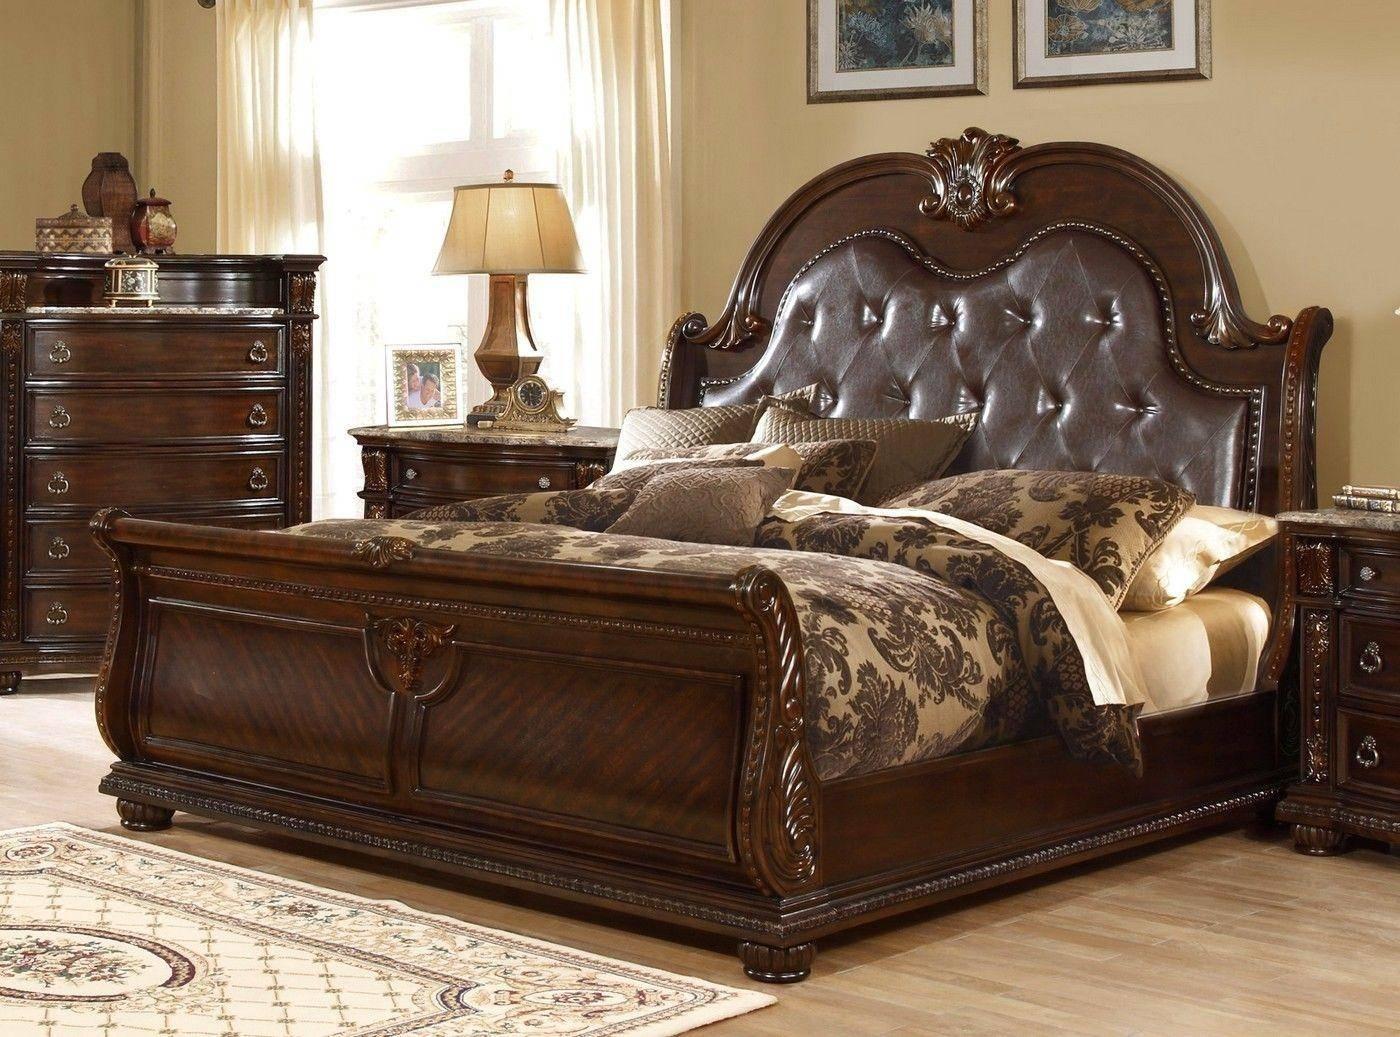 Buy Mcferran B9500 Ck California King Sleigh Bed In Amber Dark Cherry Leather Online